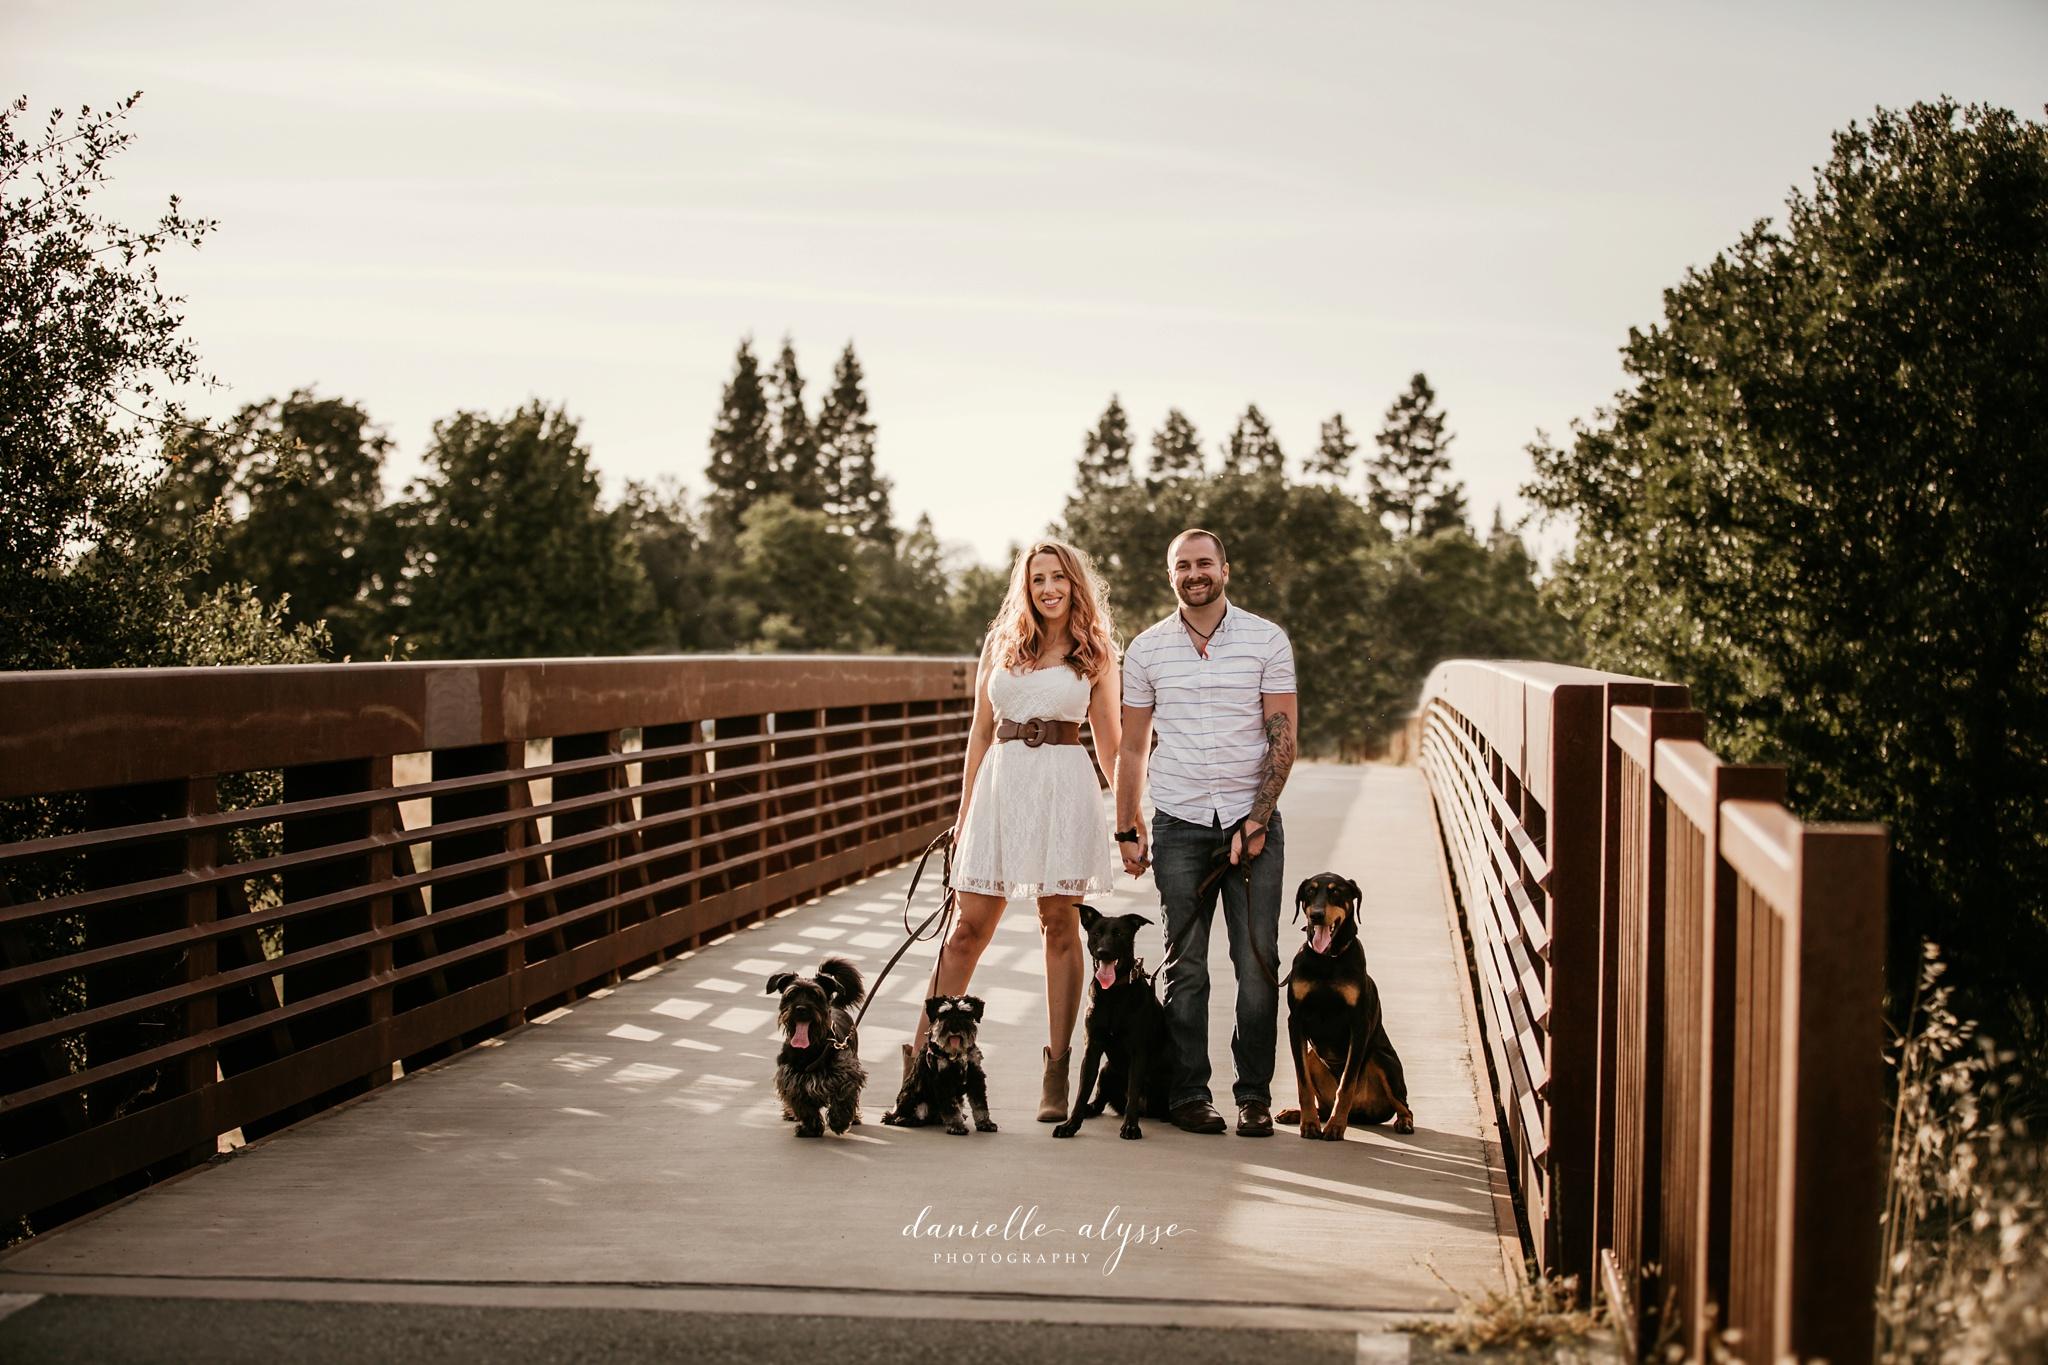 180520_engagement_sarah_jon_dogs_danielle_alysse_photography_elk_grove_photographer_blog_212_WEB.jpg